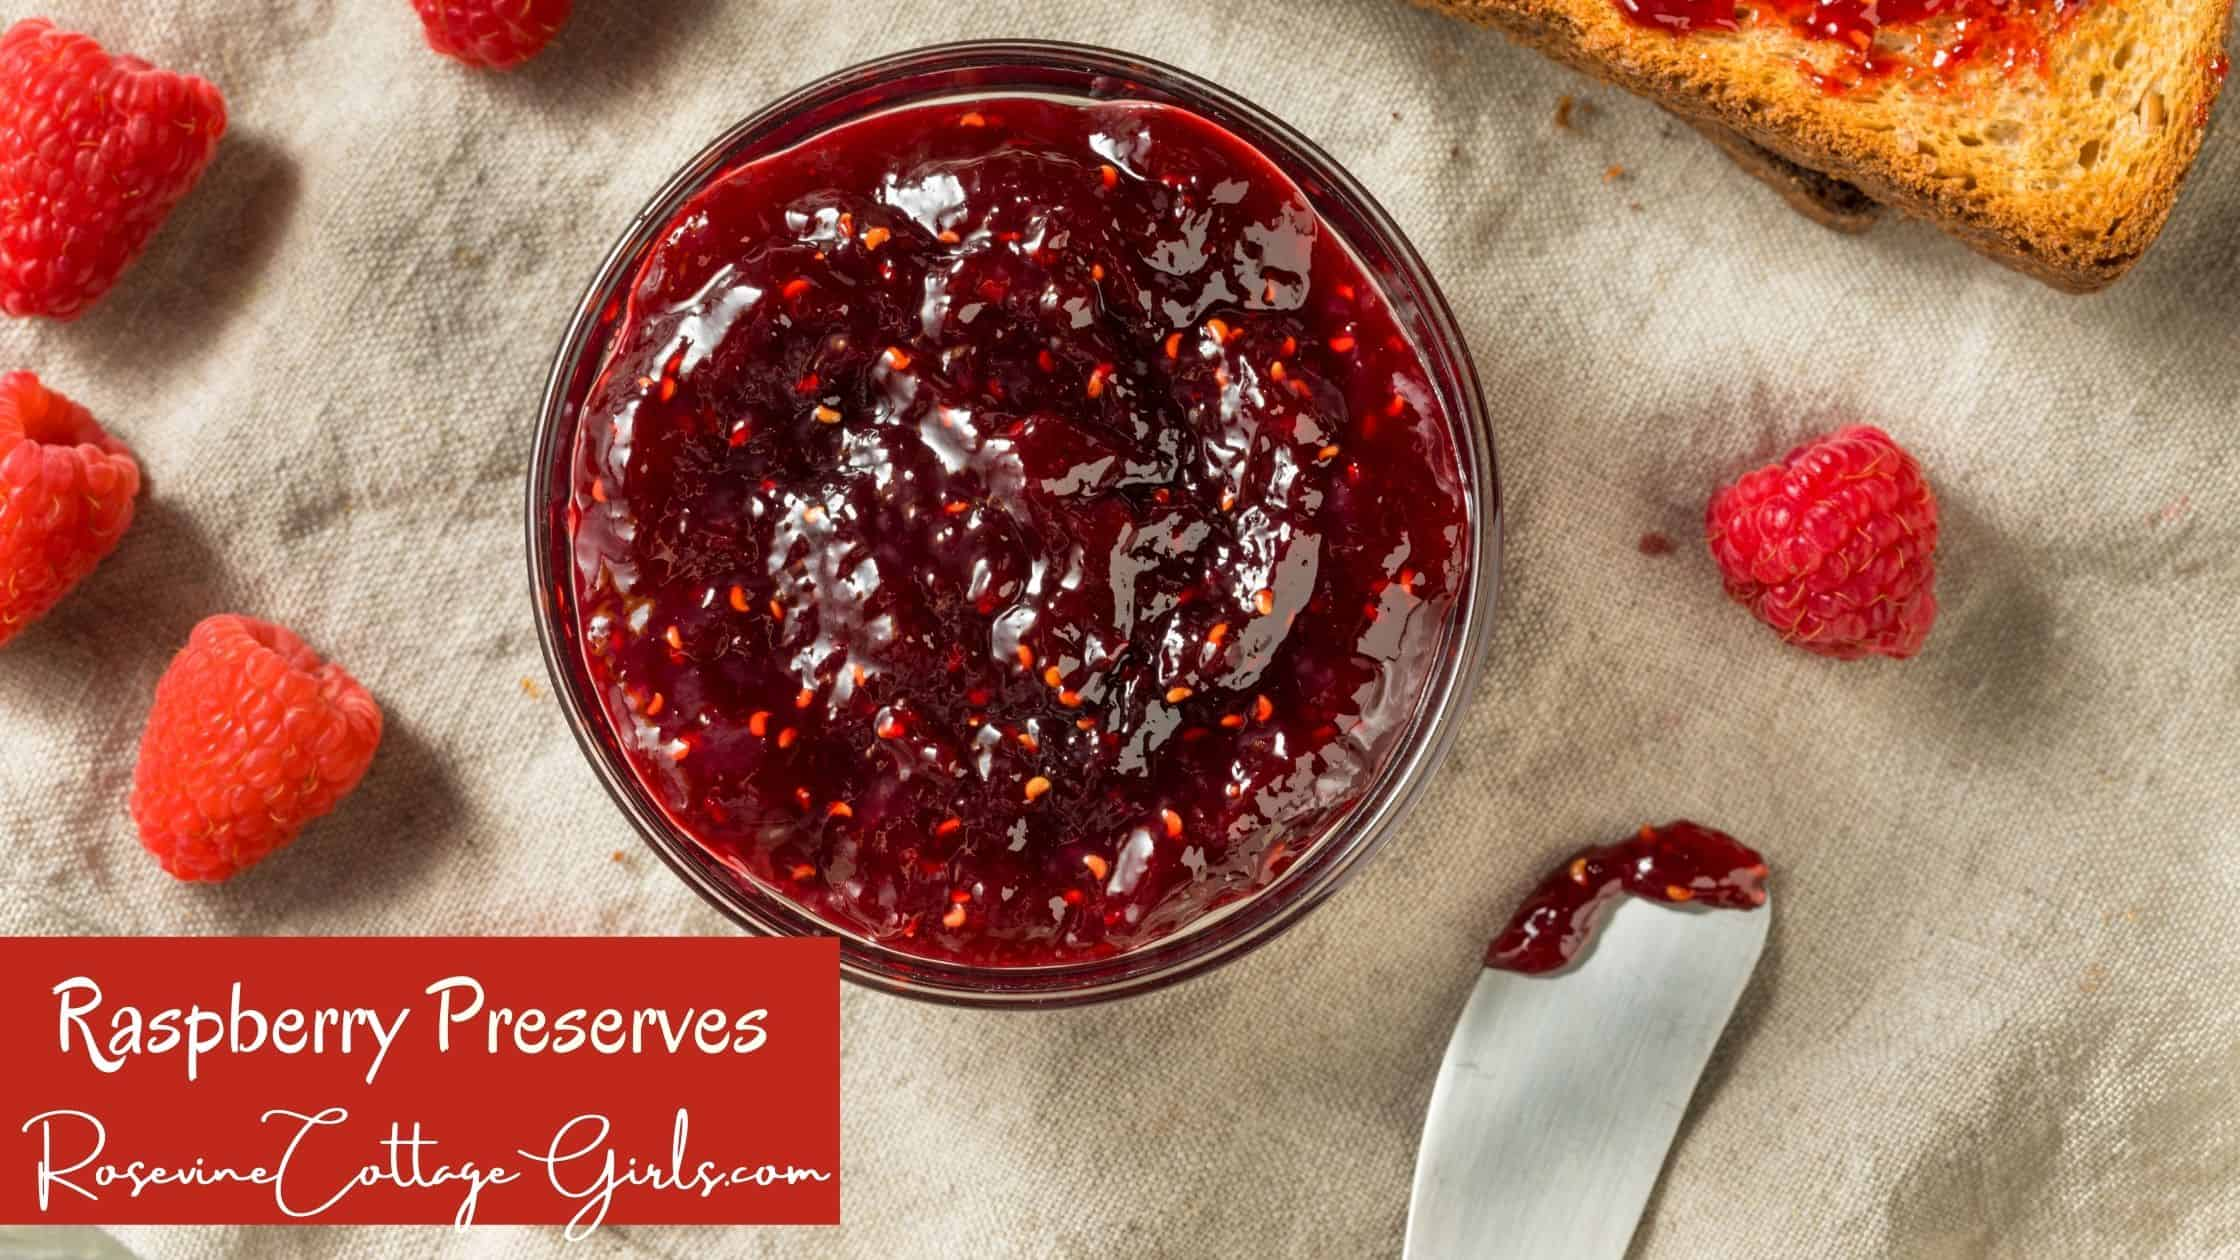 raspberry preserves main photo | photo of a bowl of raspberry preserves